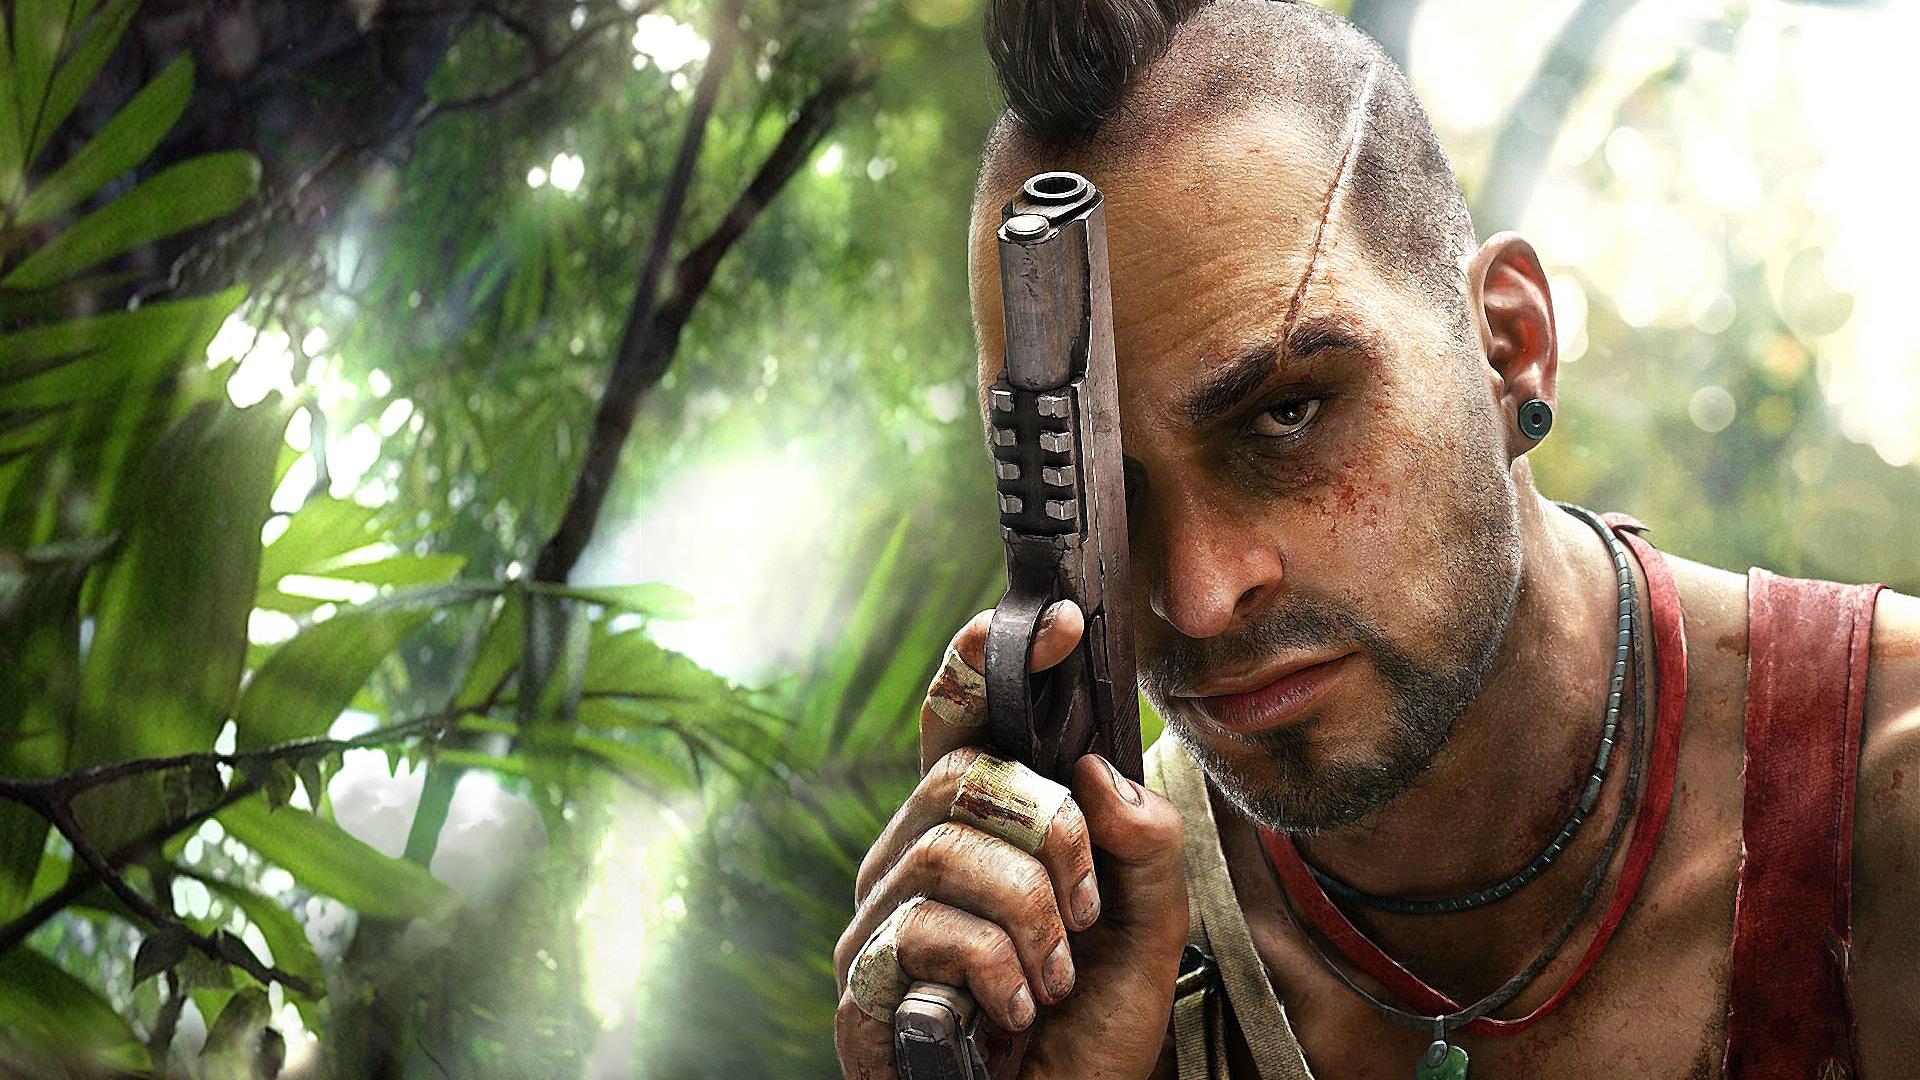 В Far Cry VR: Dive Into Insanity игроки будут противостоять Ваасу и его банде